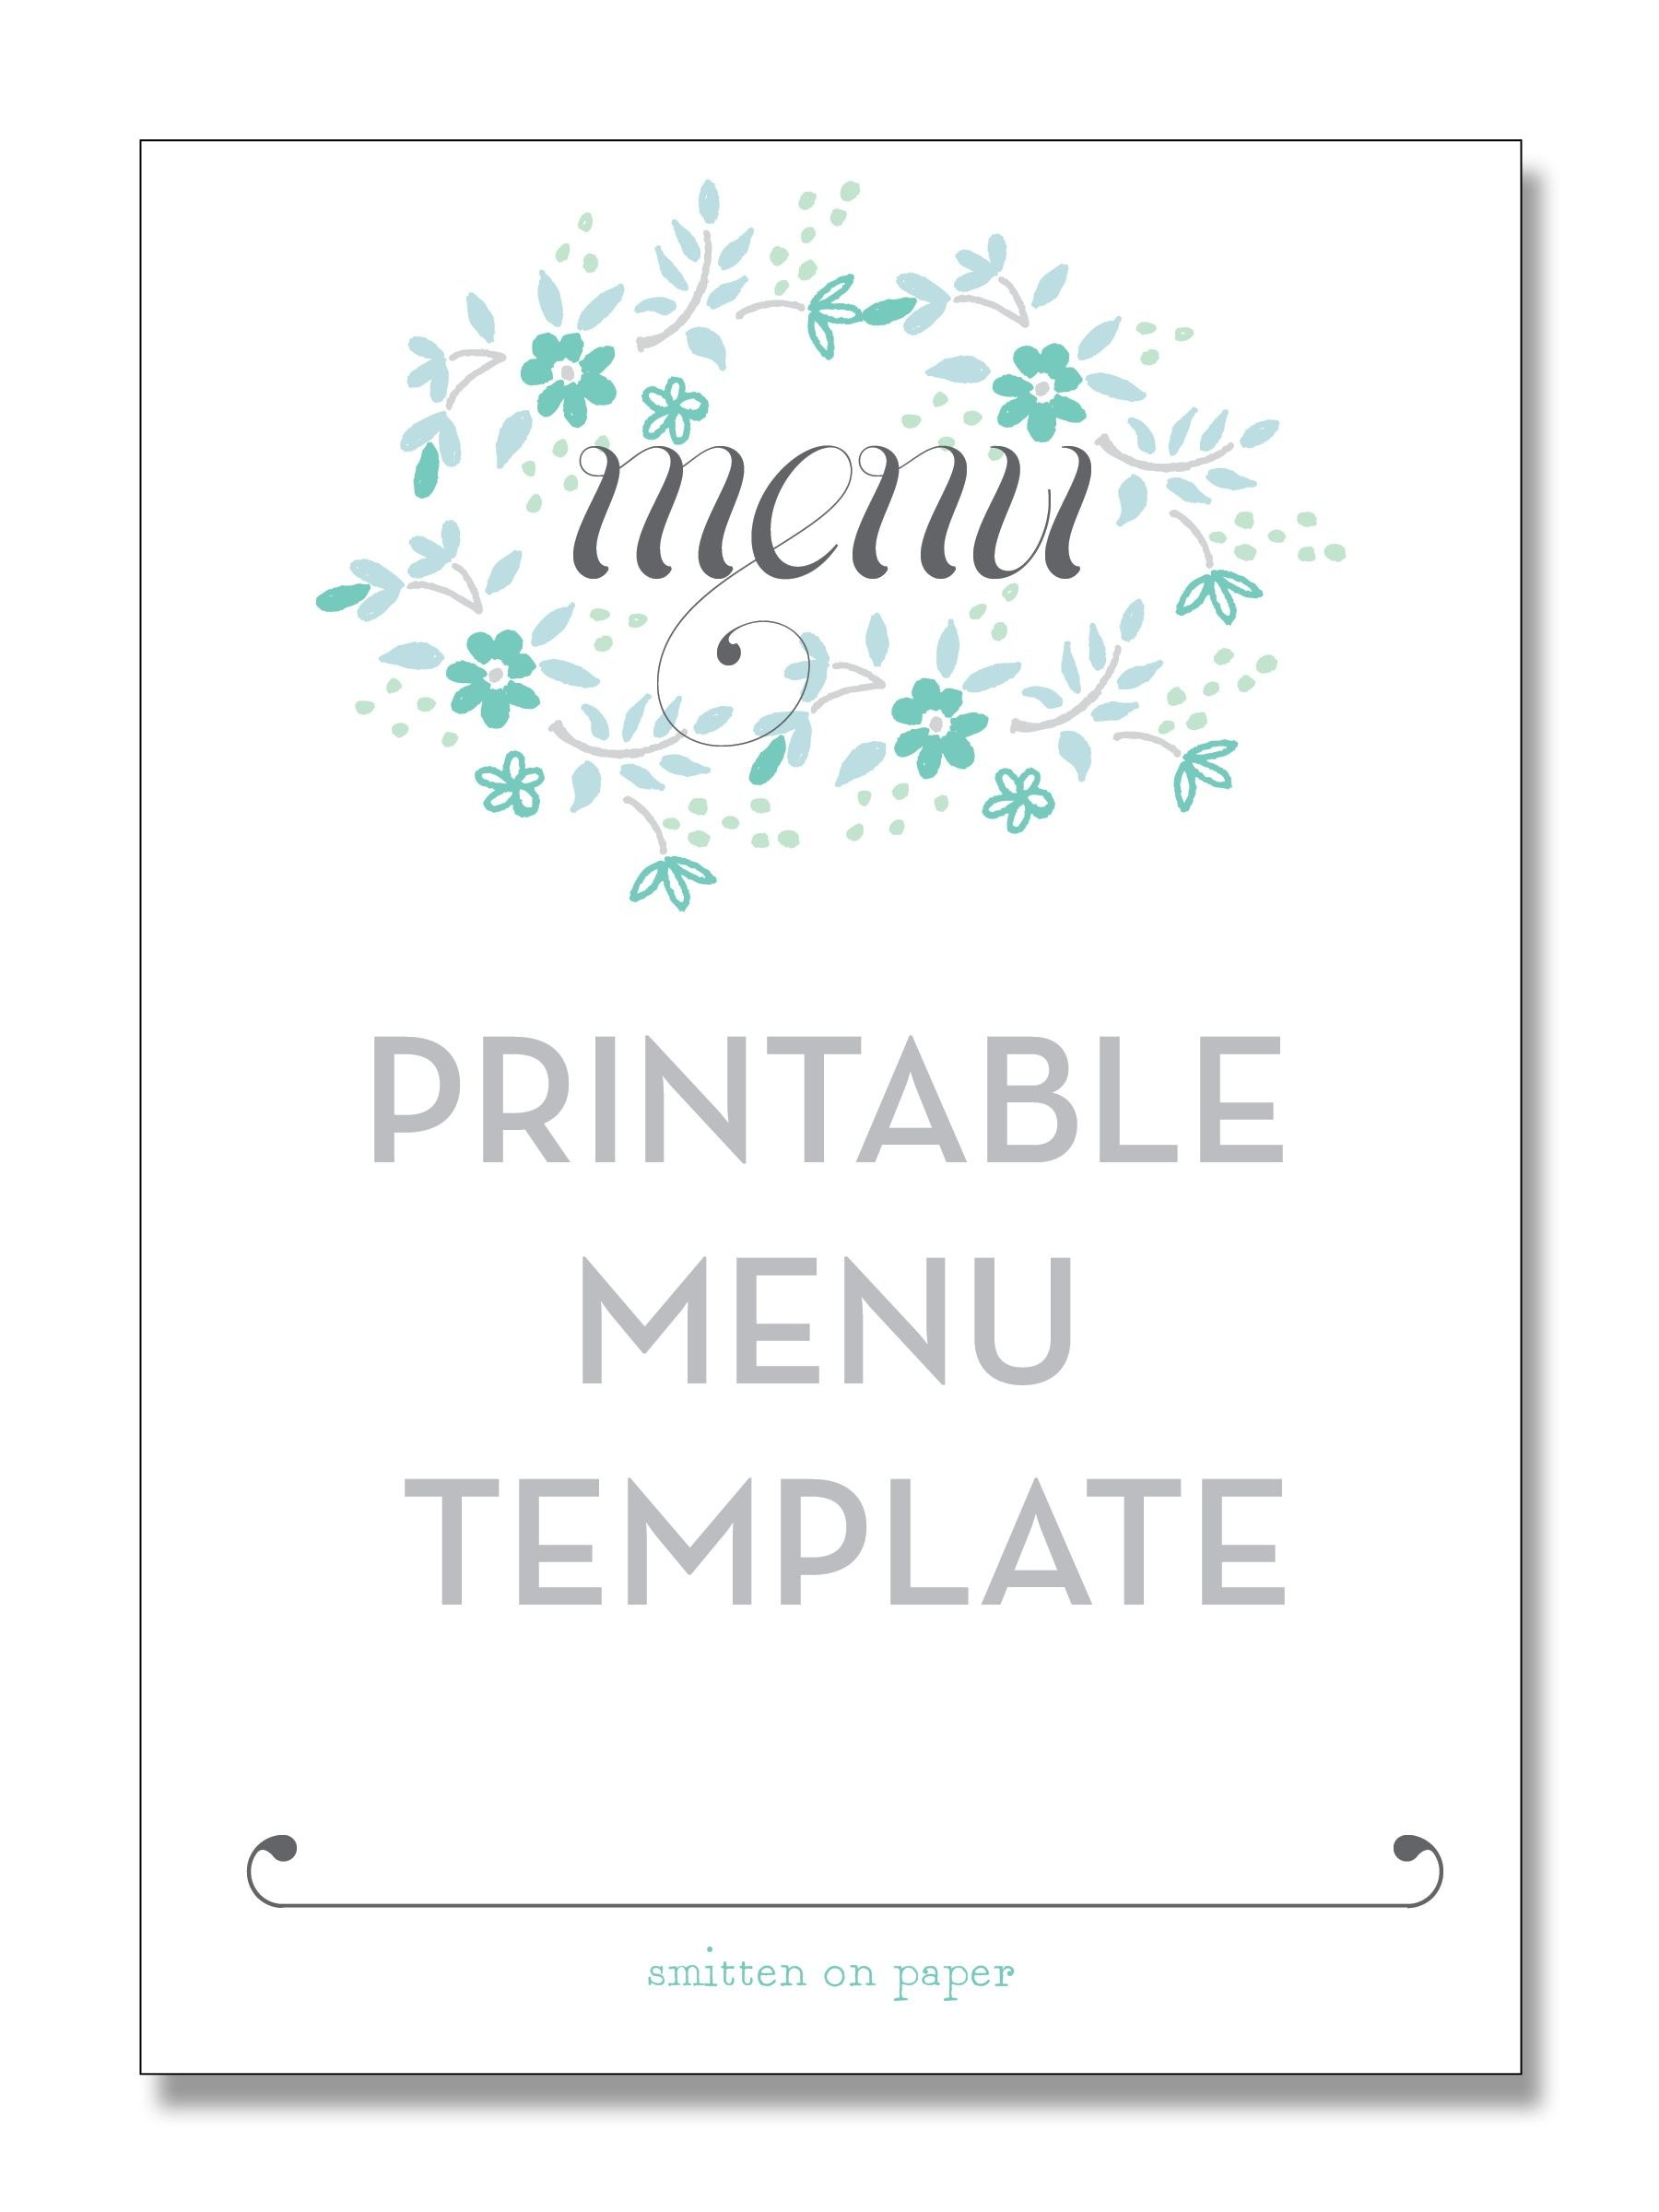 Freebie Friday Printable Menu  Party Time  Printable Menu Menu Within Free Printable Menu Template